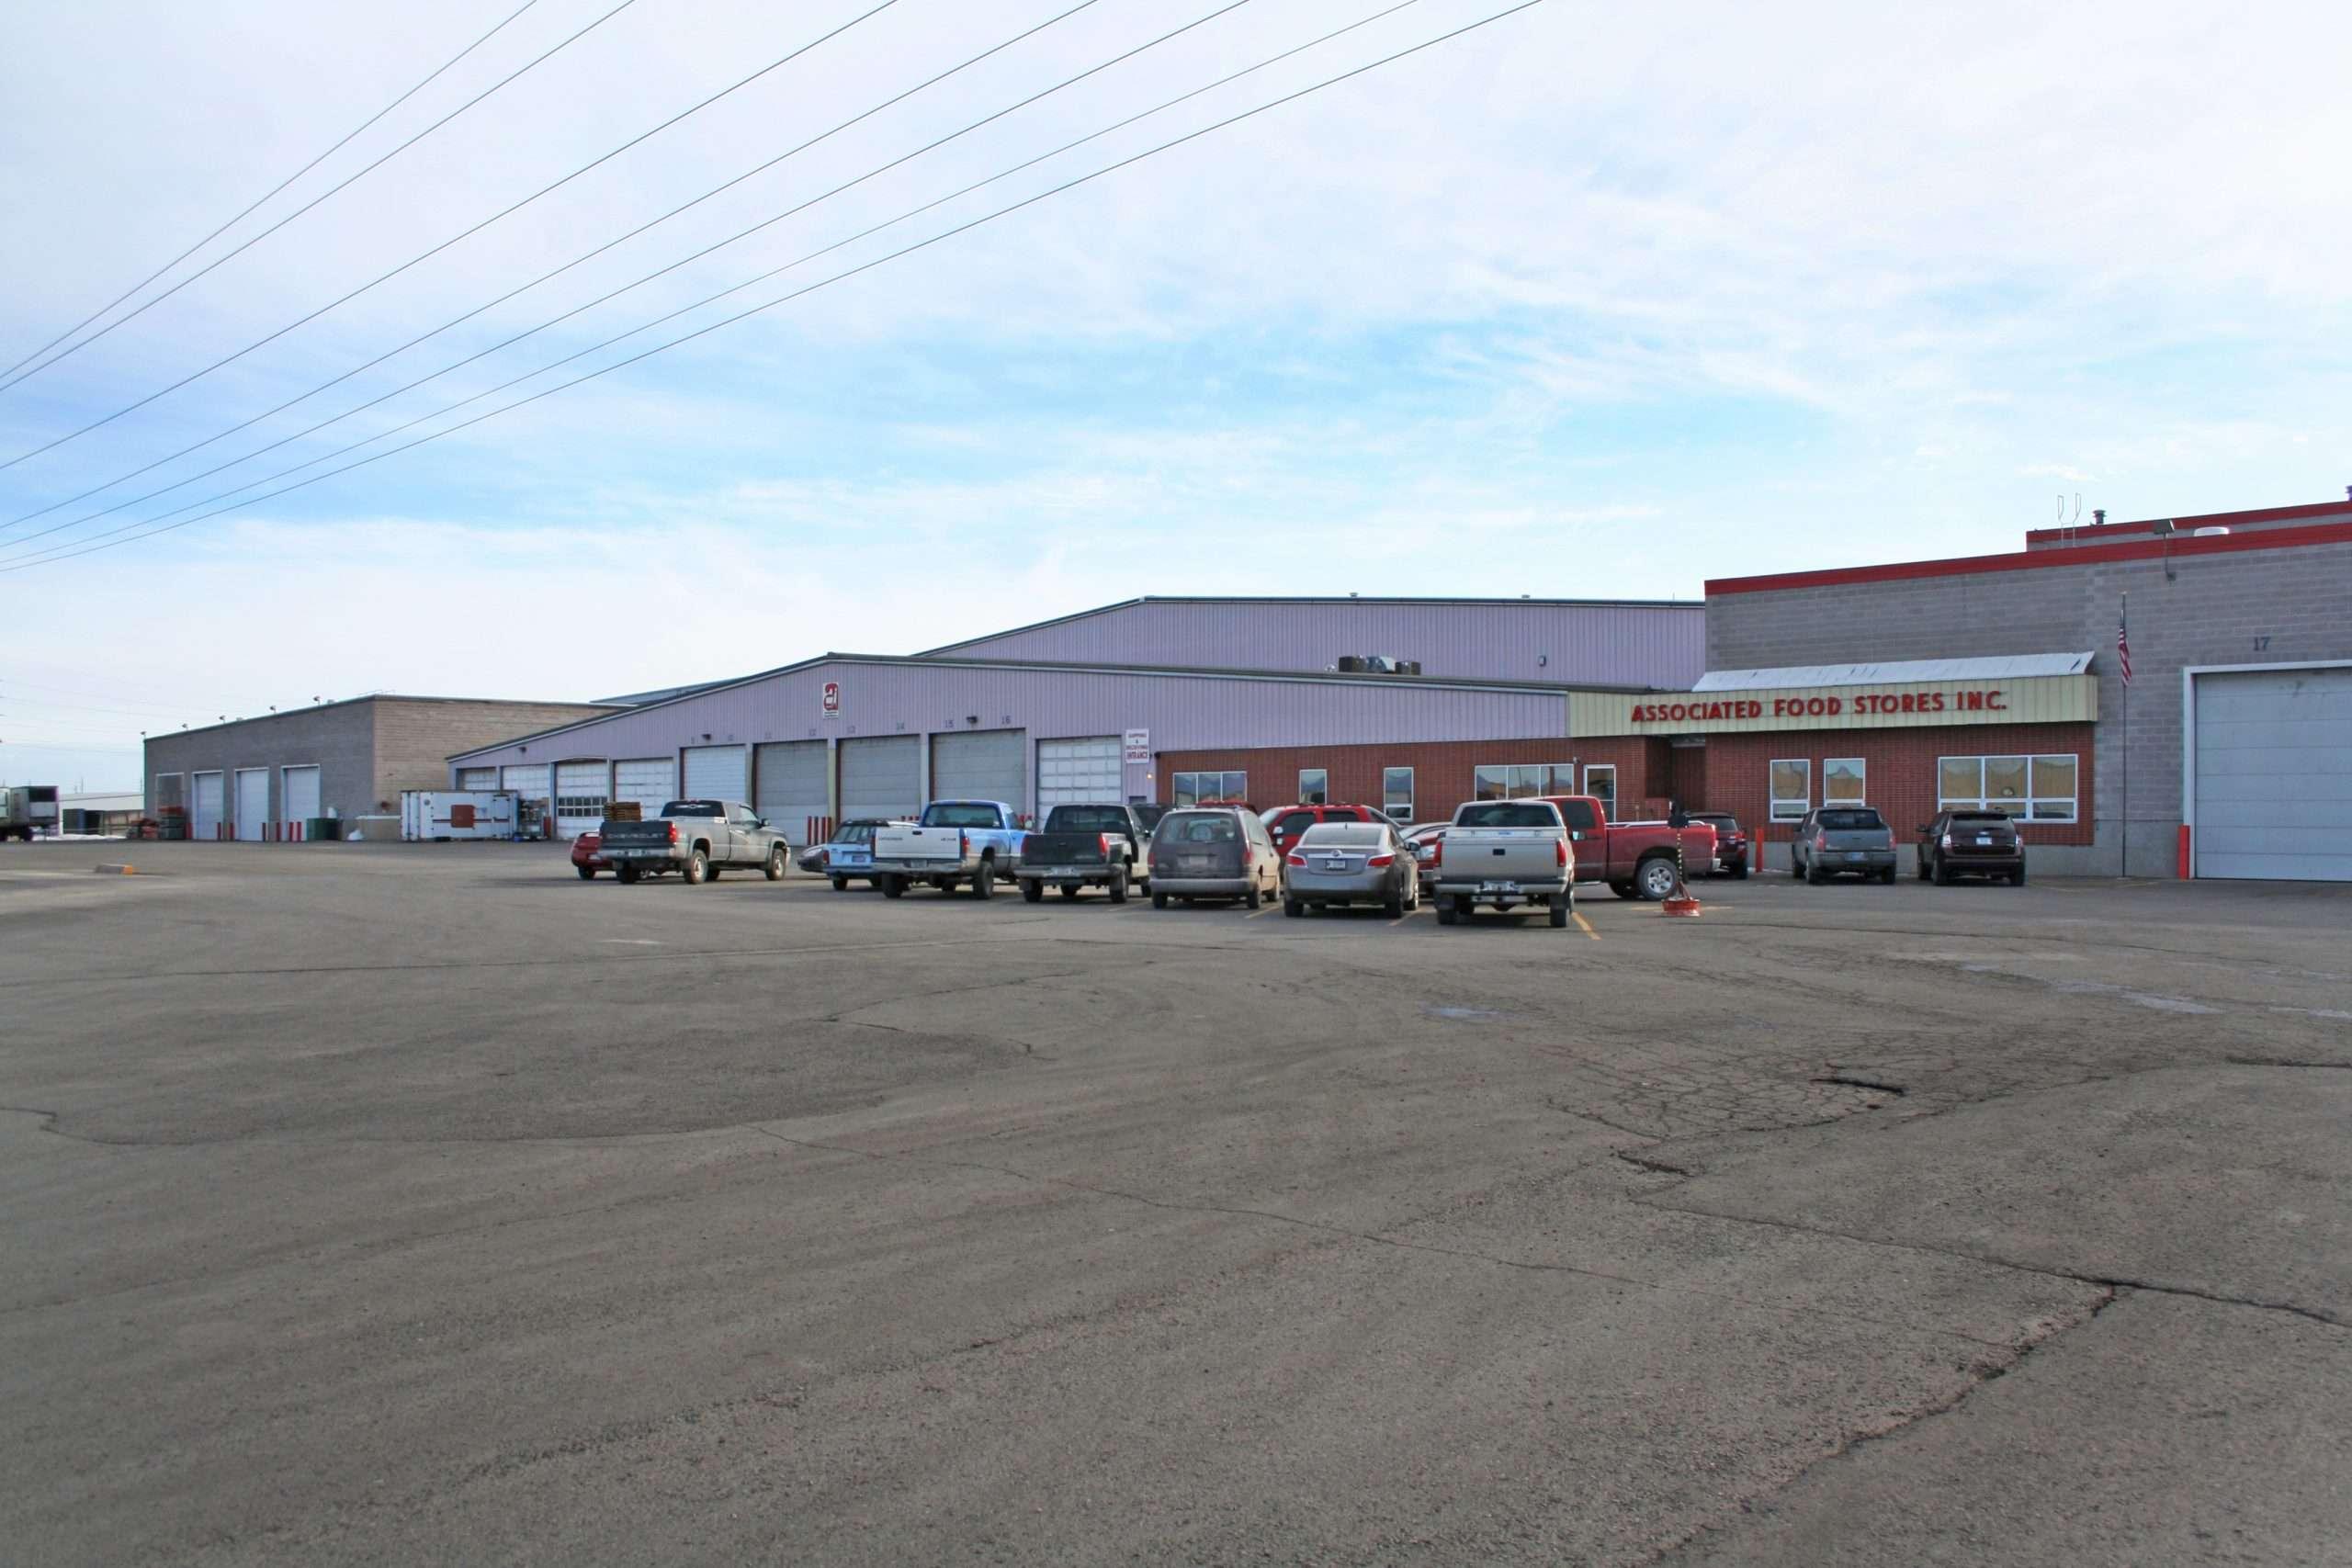 The Helena, Montana Warehouse Opened